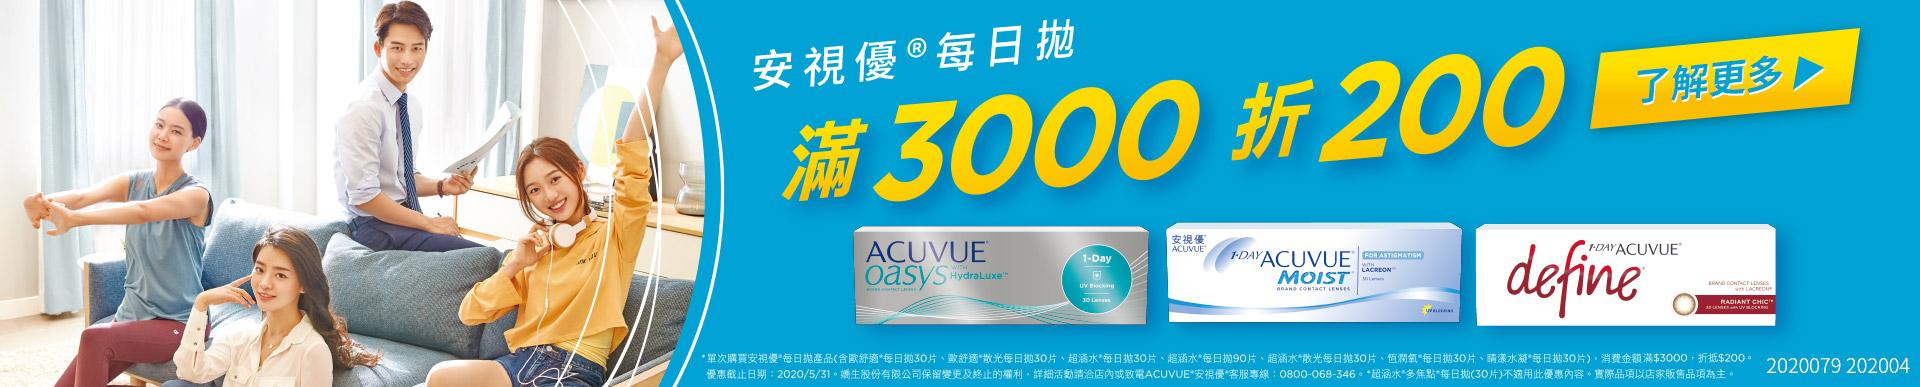 acuvue-promotion-banner.jpg